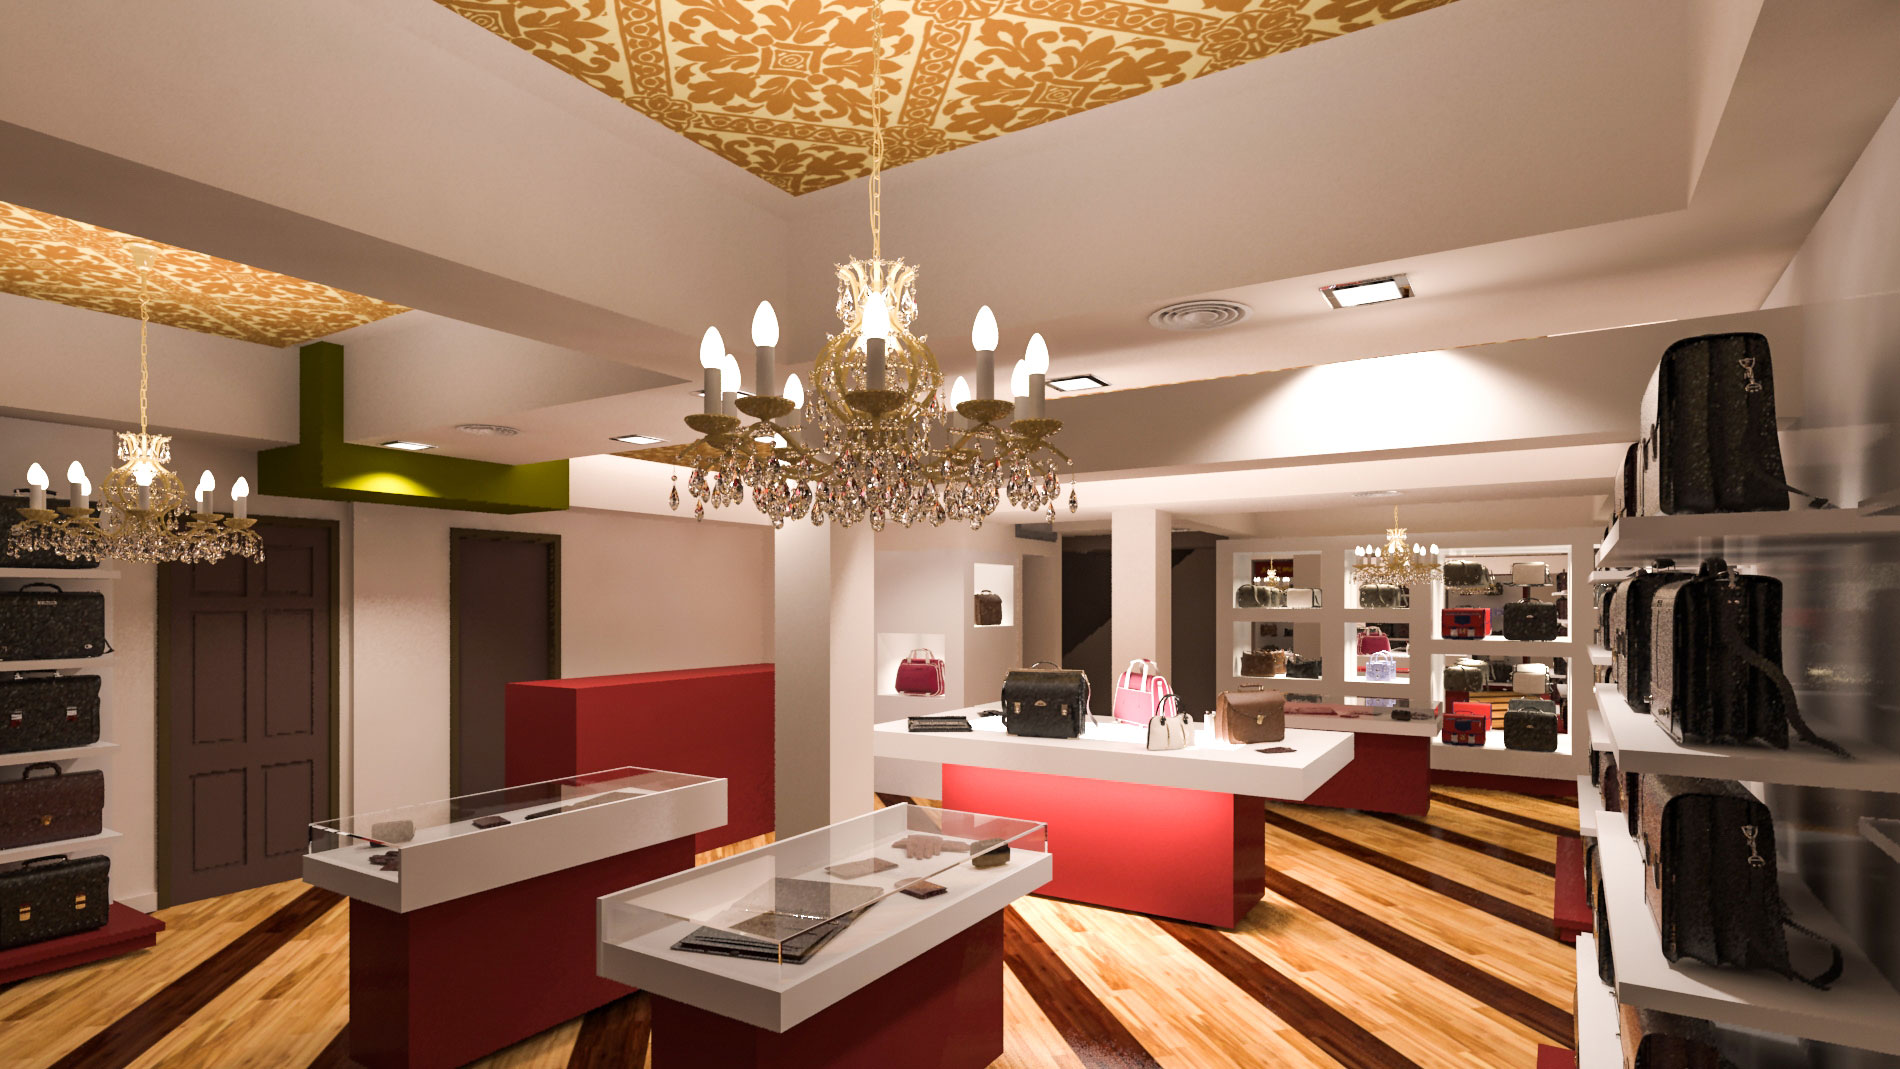 render, rendering, 3d, design, domon, architects, consultants